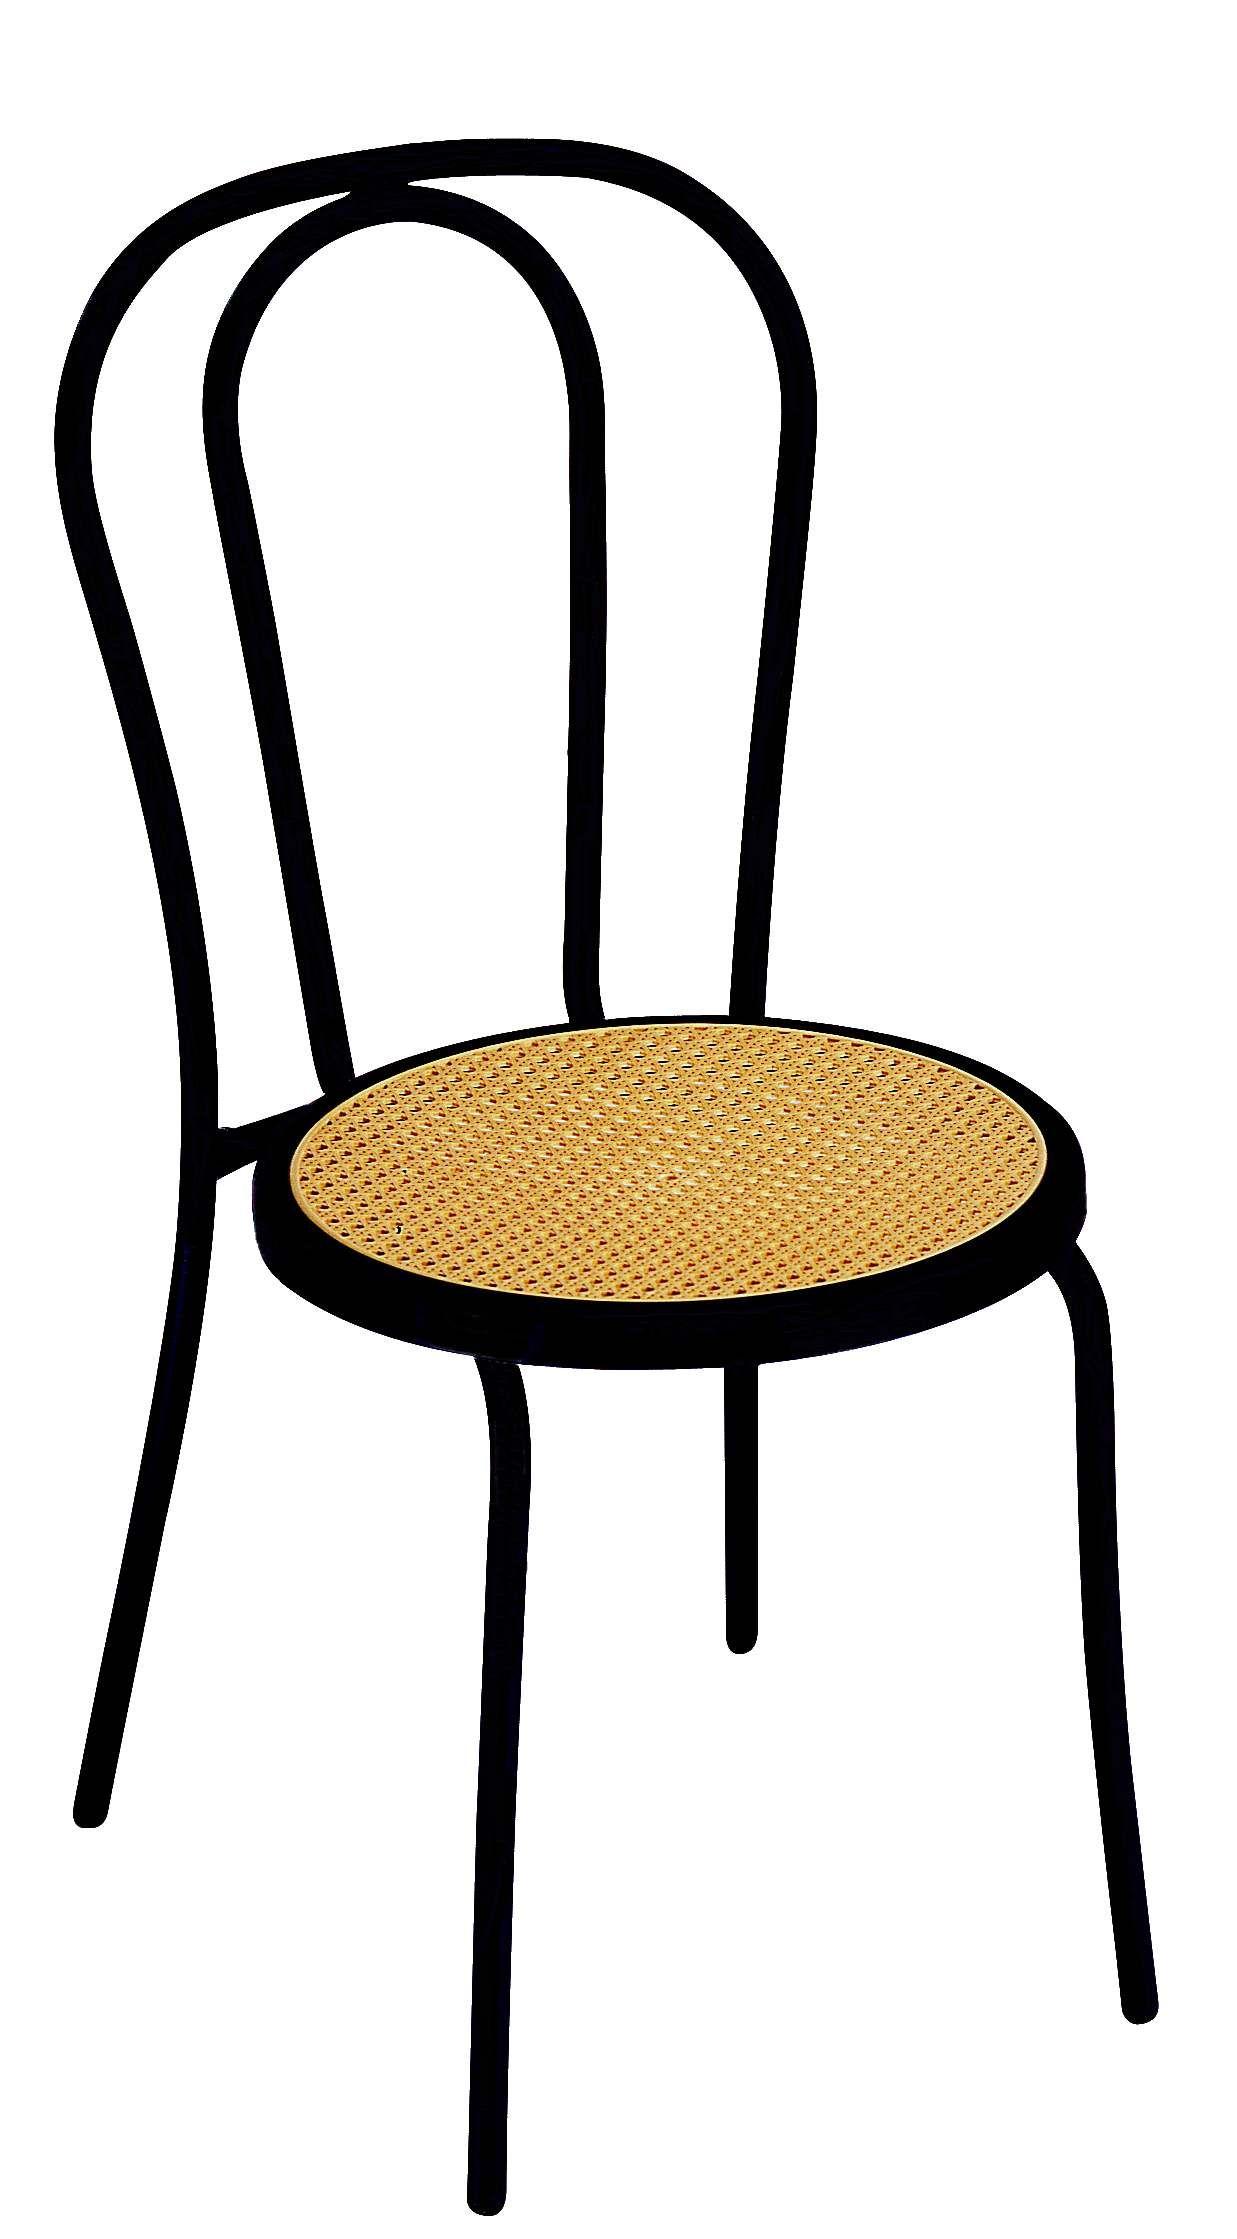 chaise bistro retro paille noir chaise chair chaiseempilable terrasse mobilierjardin - Chaise Retro